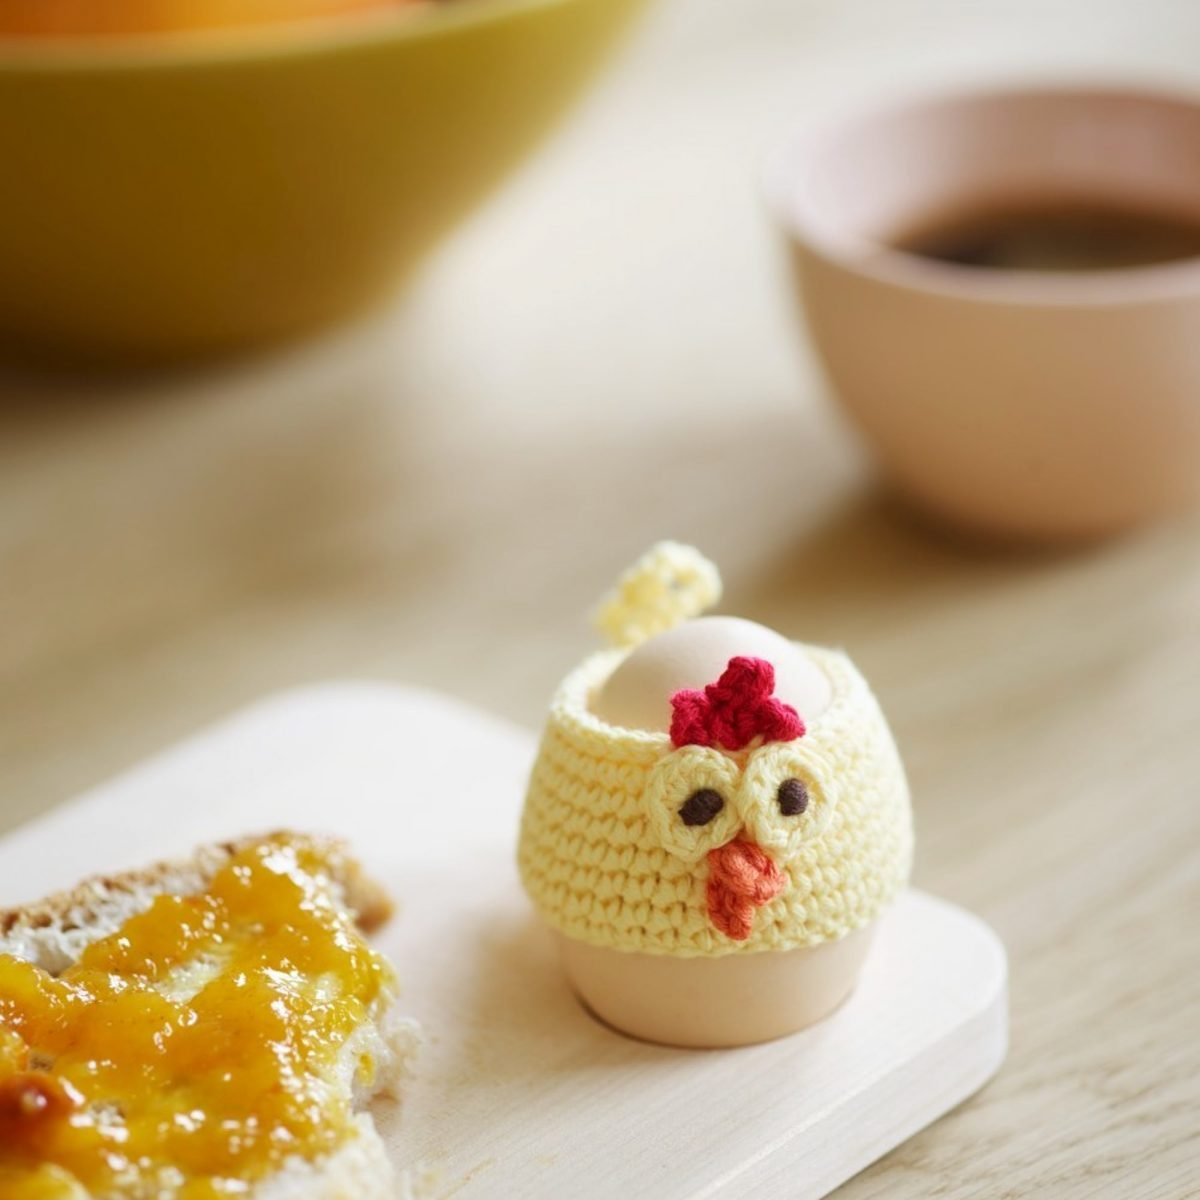 Eggvarmere